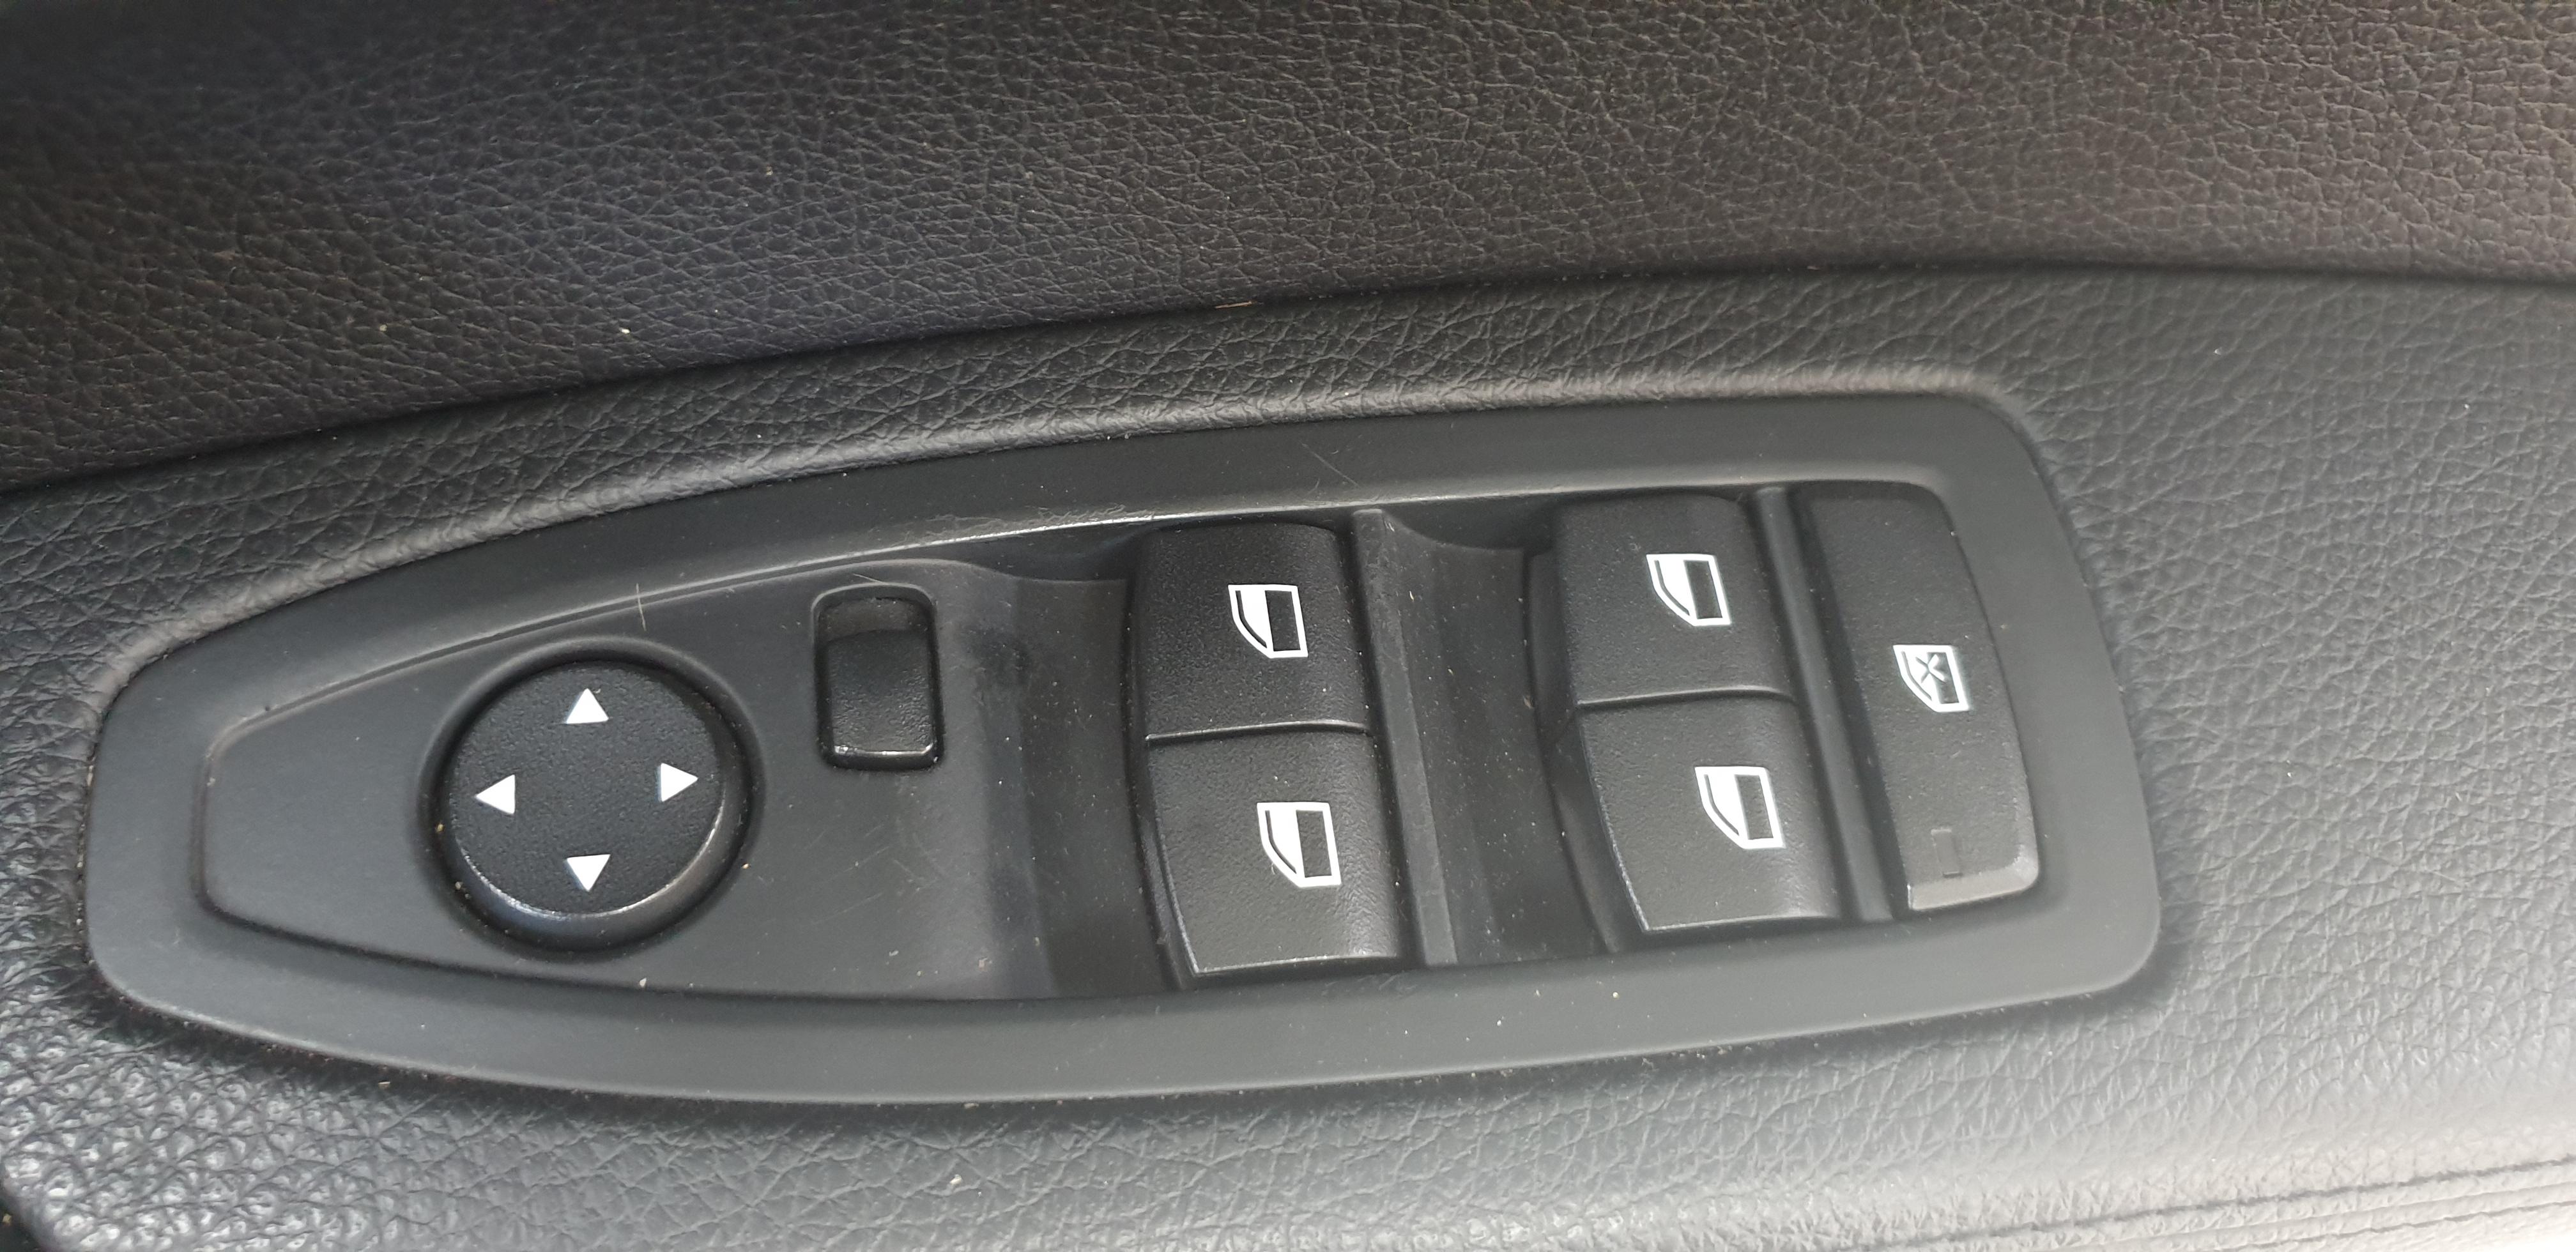 BMW 1 SERIES 116i 5DR (F20)